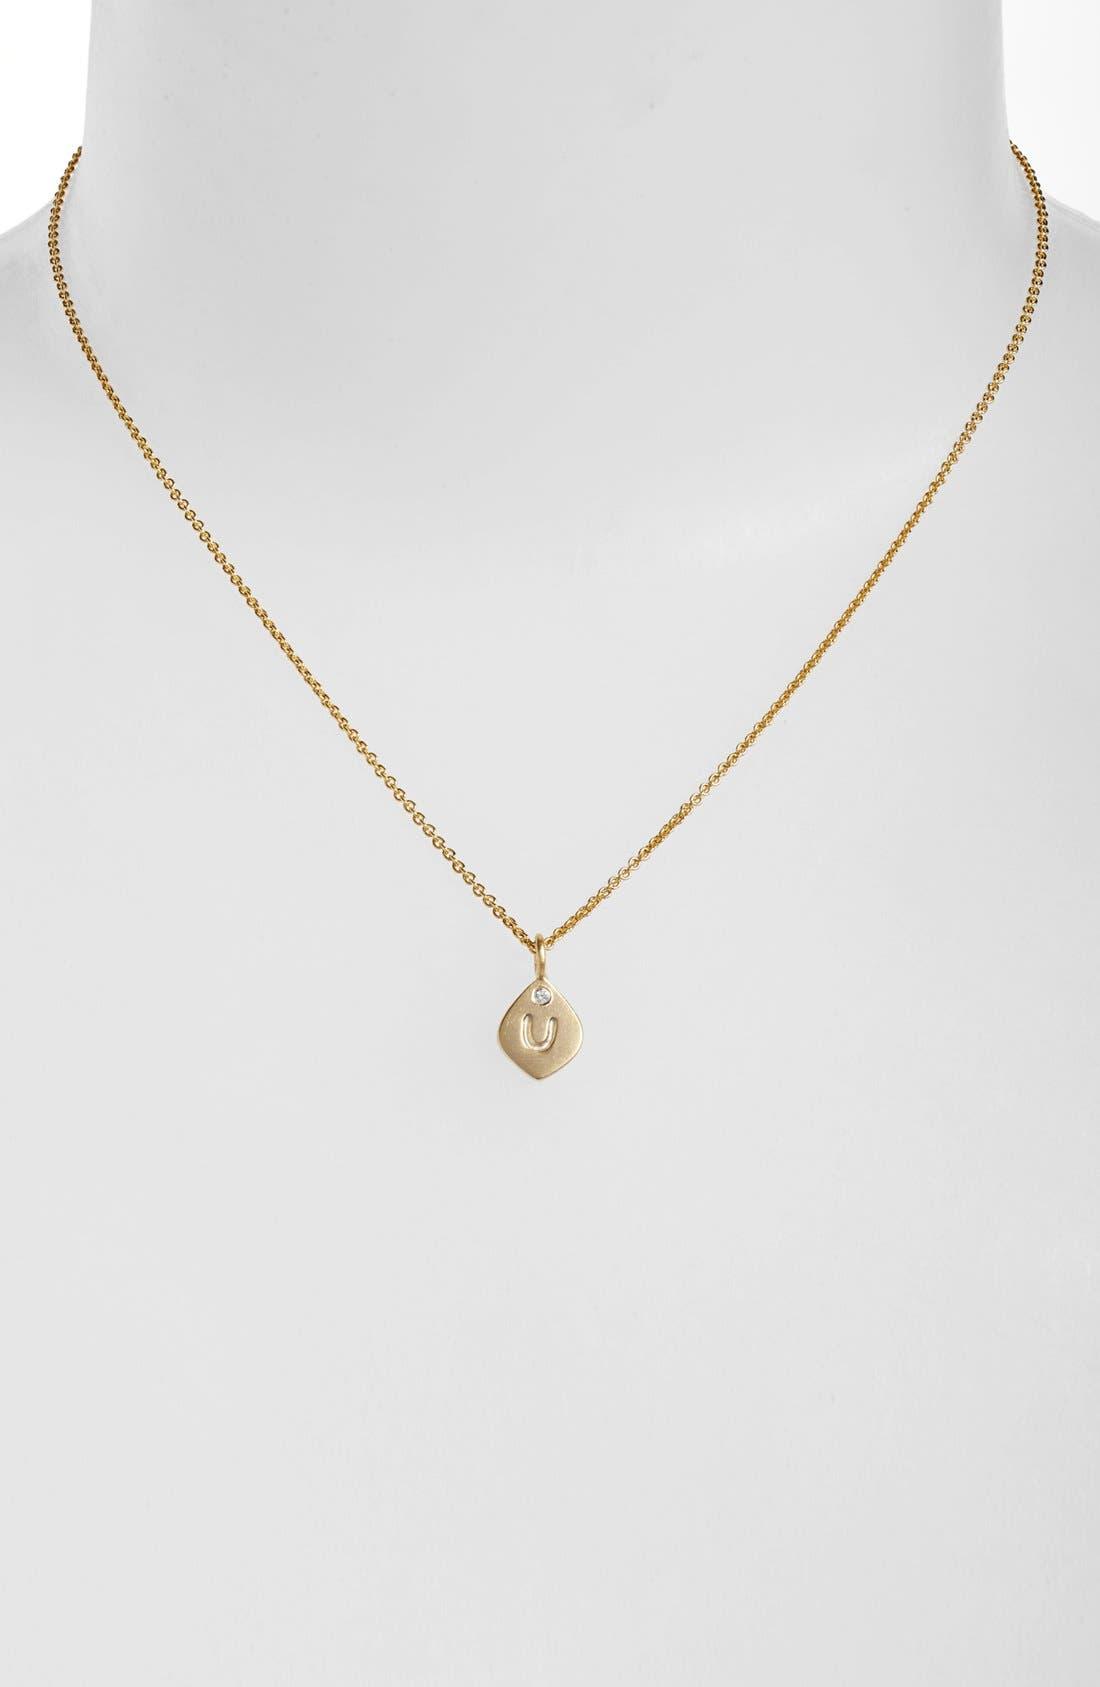 Alternate Image 1 Selected - NuNu Designs Small Initial Pendant Necklace